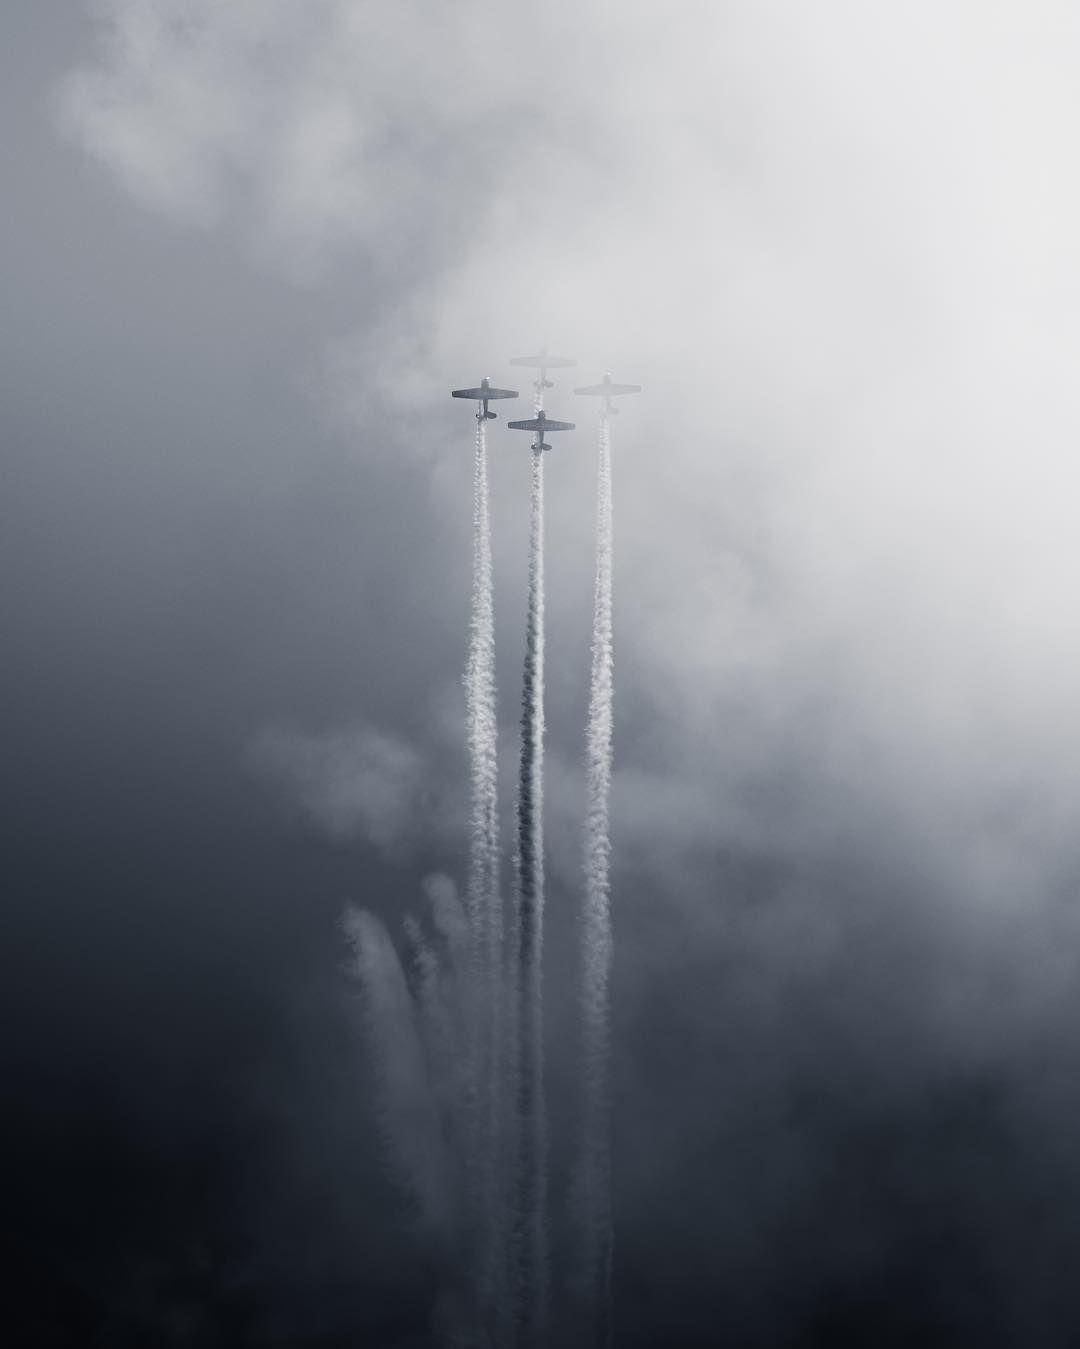 Minimalist And Cinematic Drone Photography By Simeon Pratt